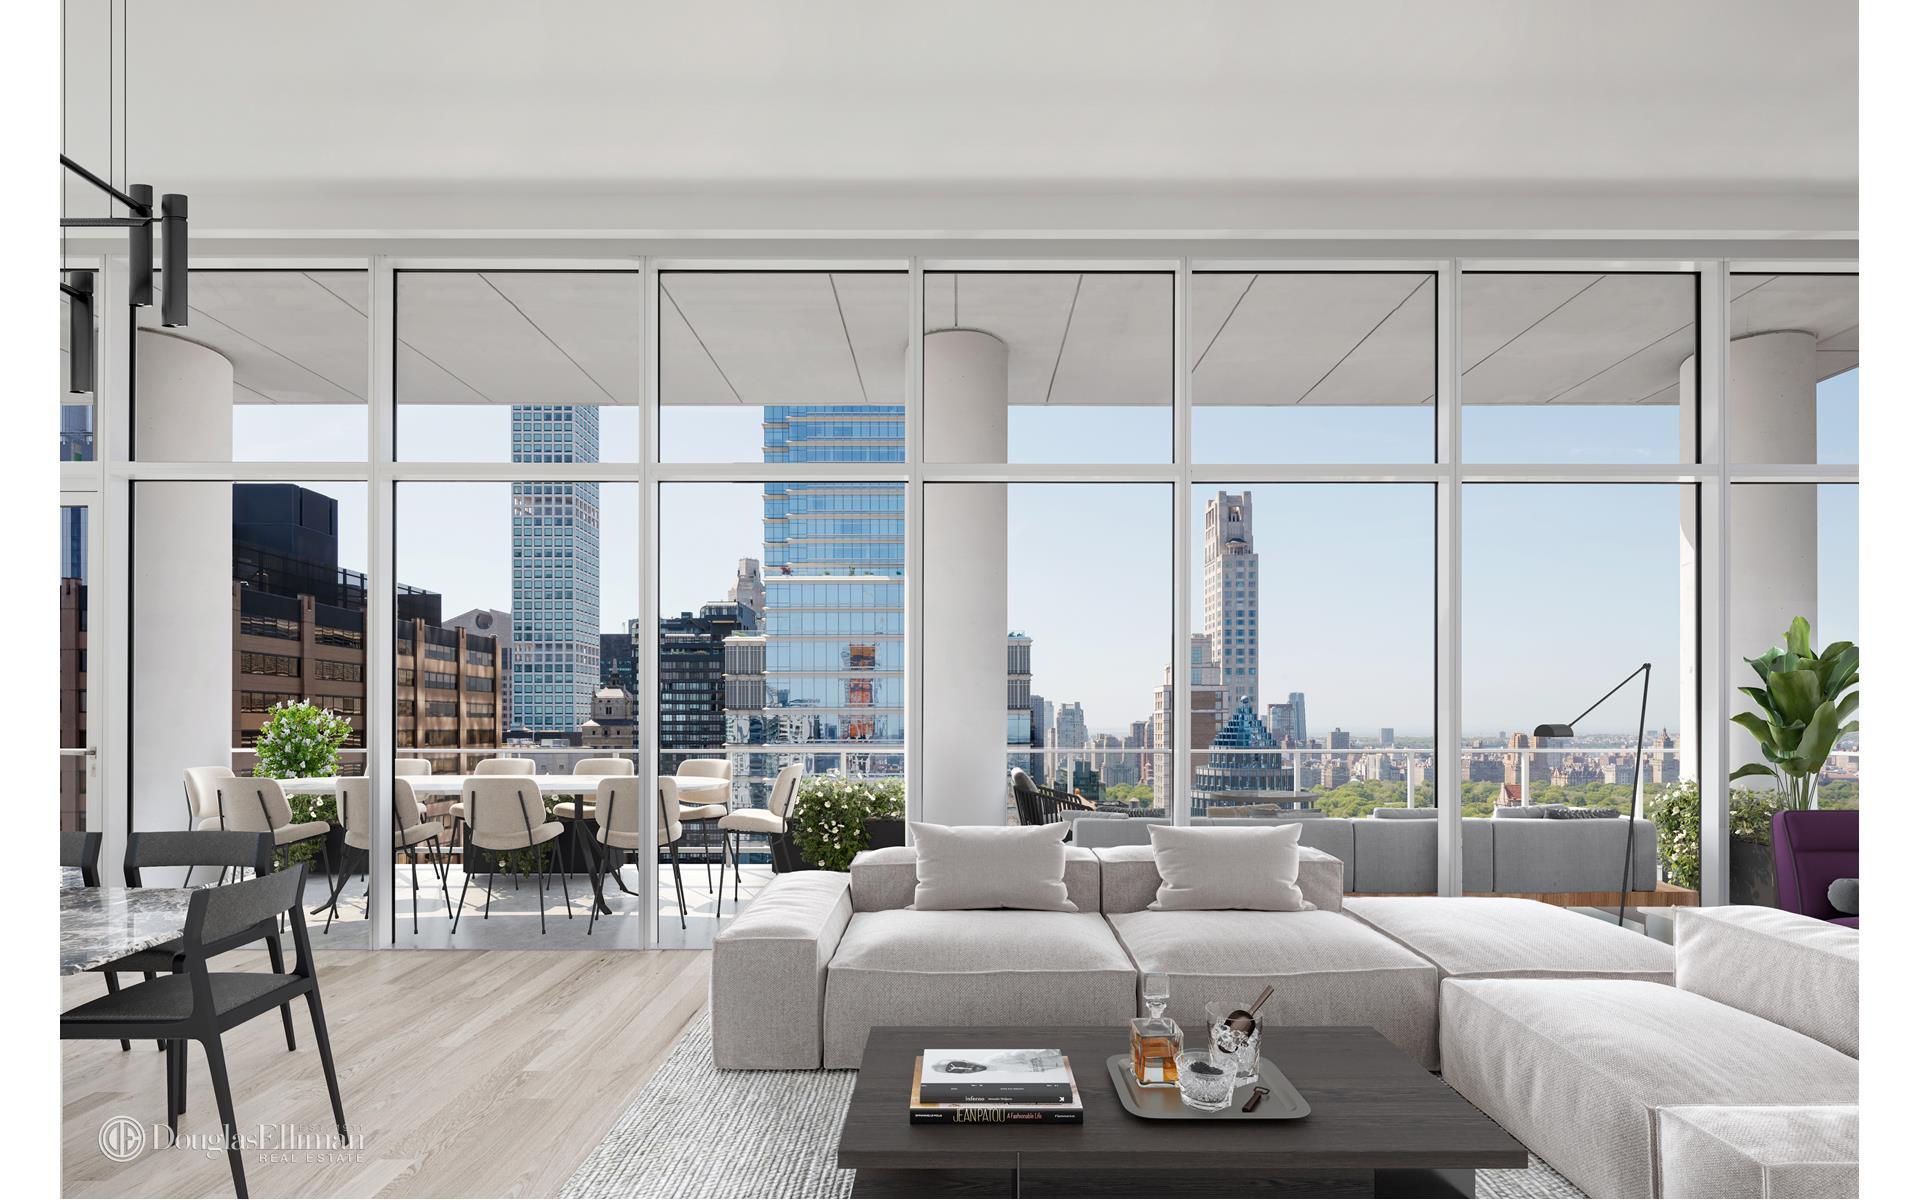 200 East 59th Street Upper East Side New York NY 10021